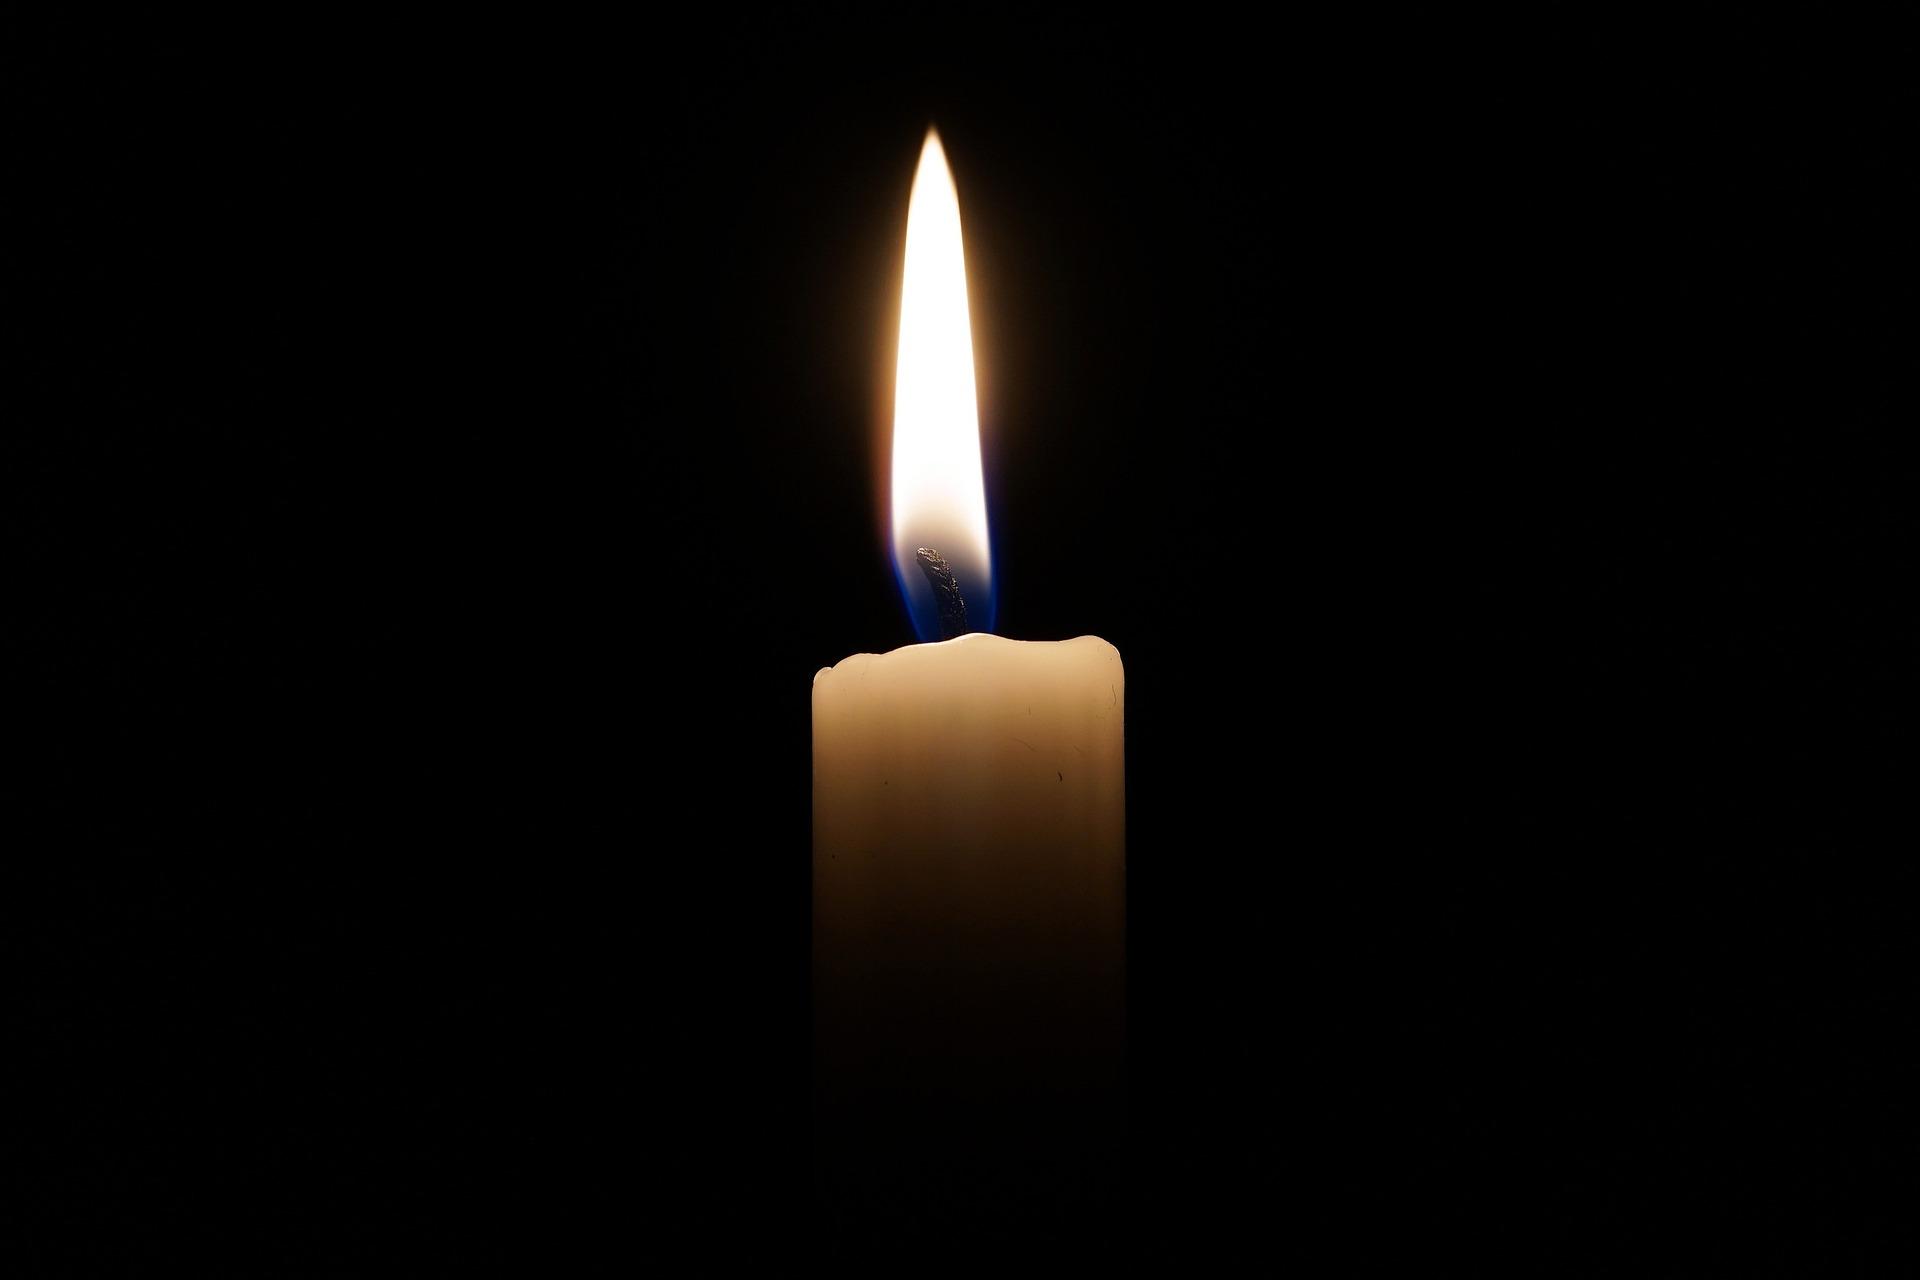 candle-2038736_1920